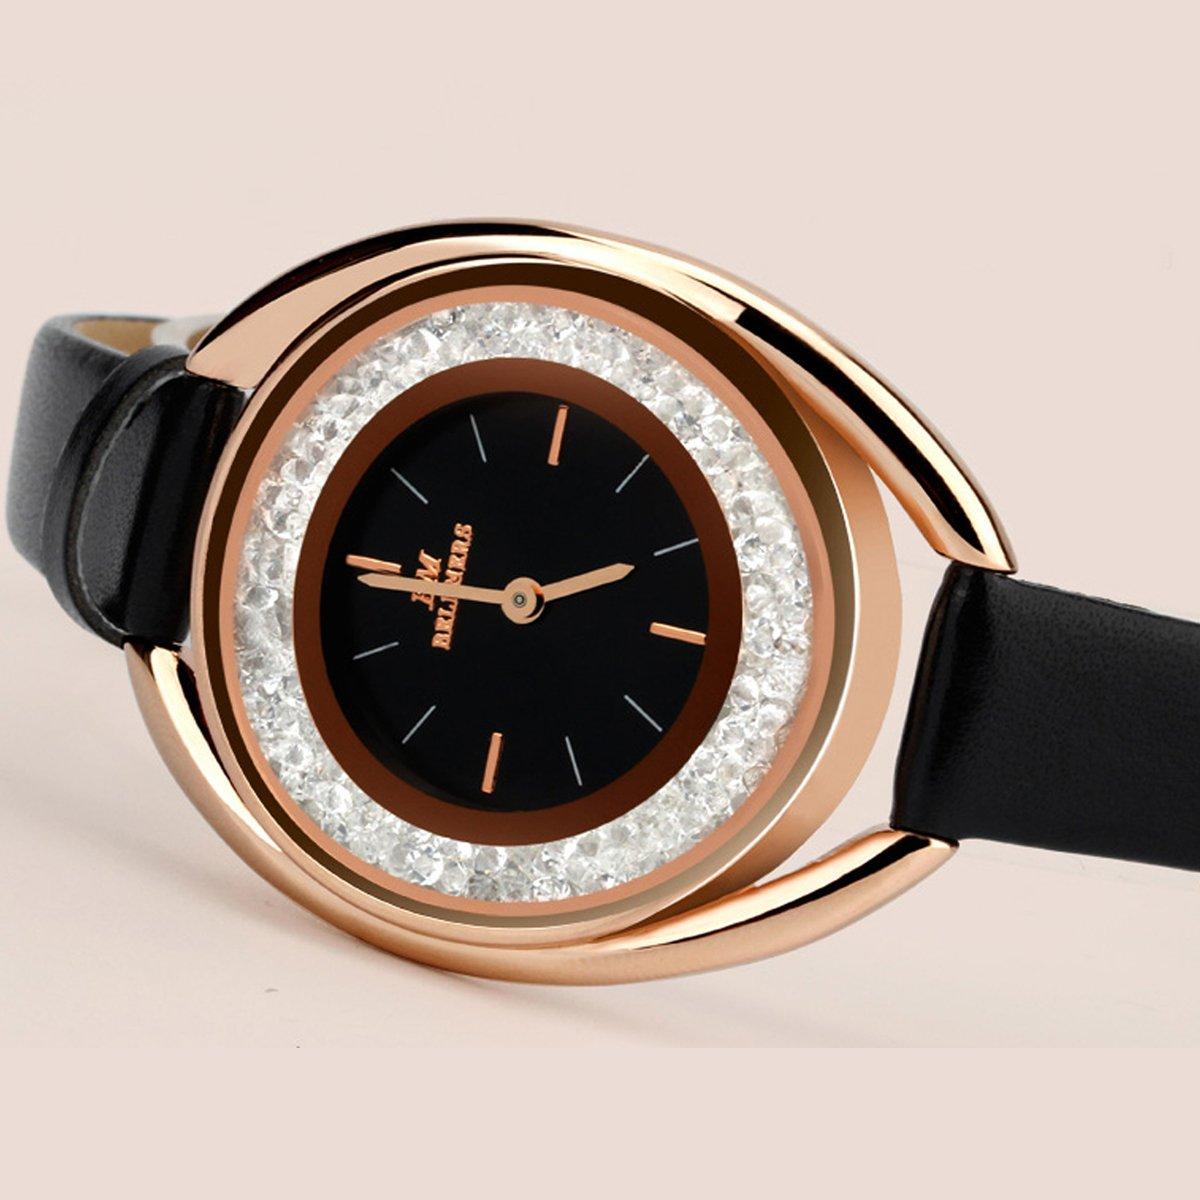 Longqi 30M Waterproof Women Quartz Watch with Leather Strap Swiss Wristwatches